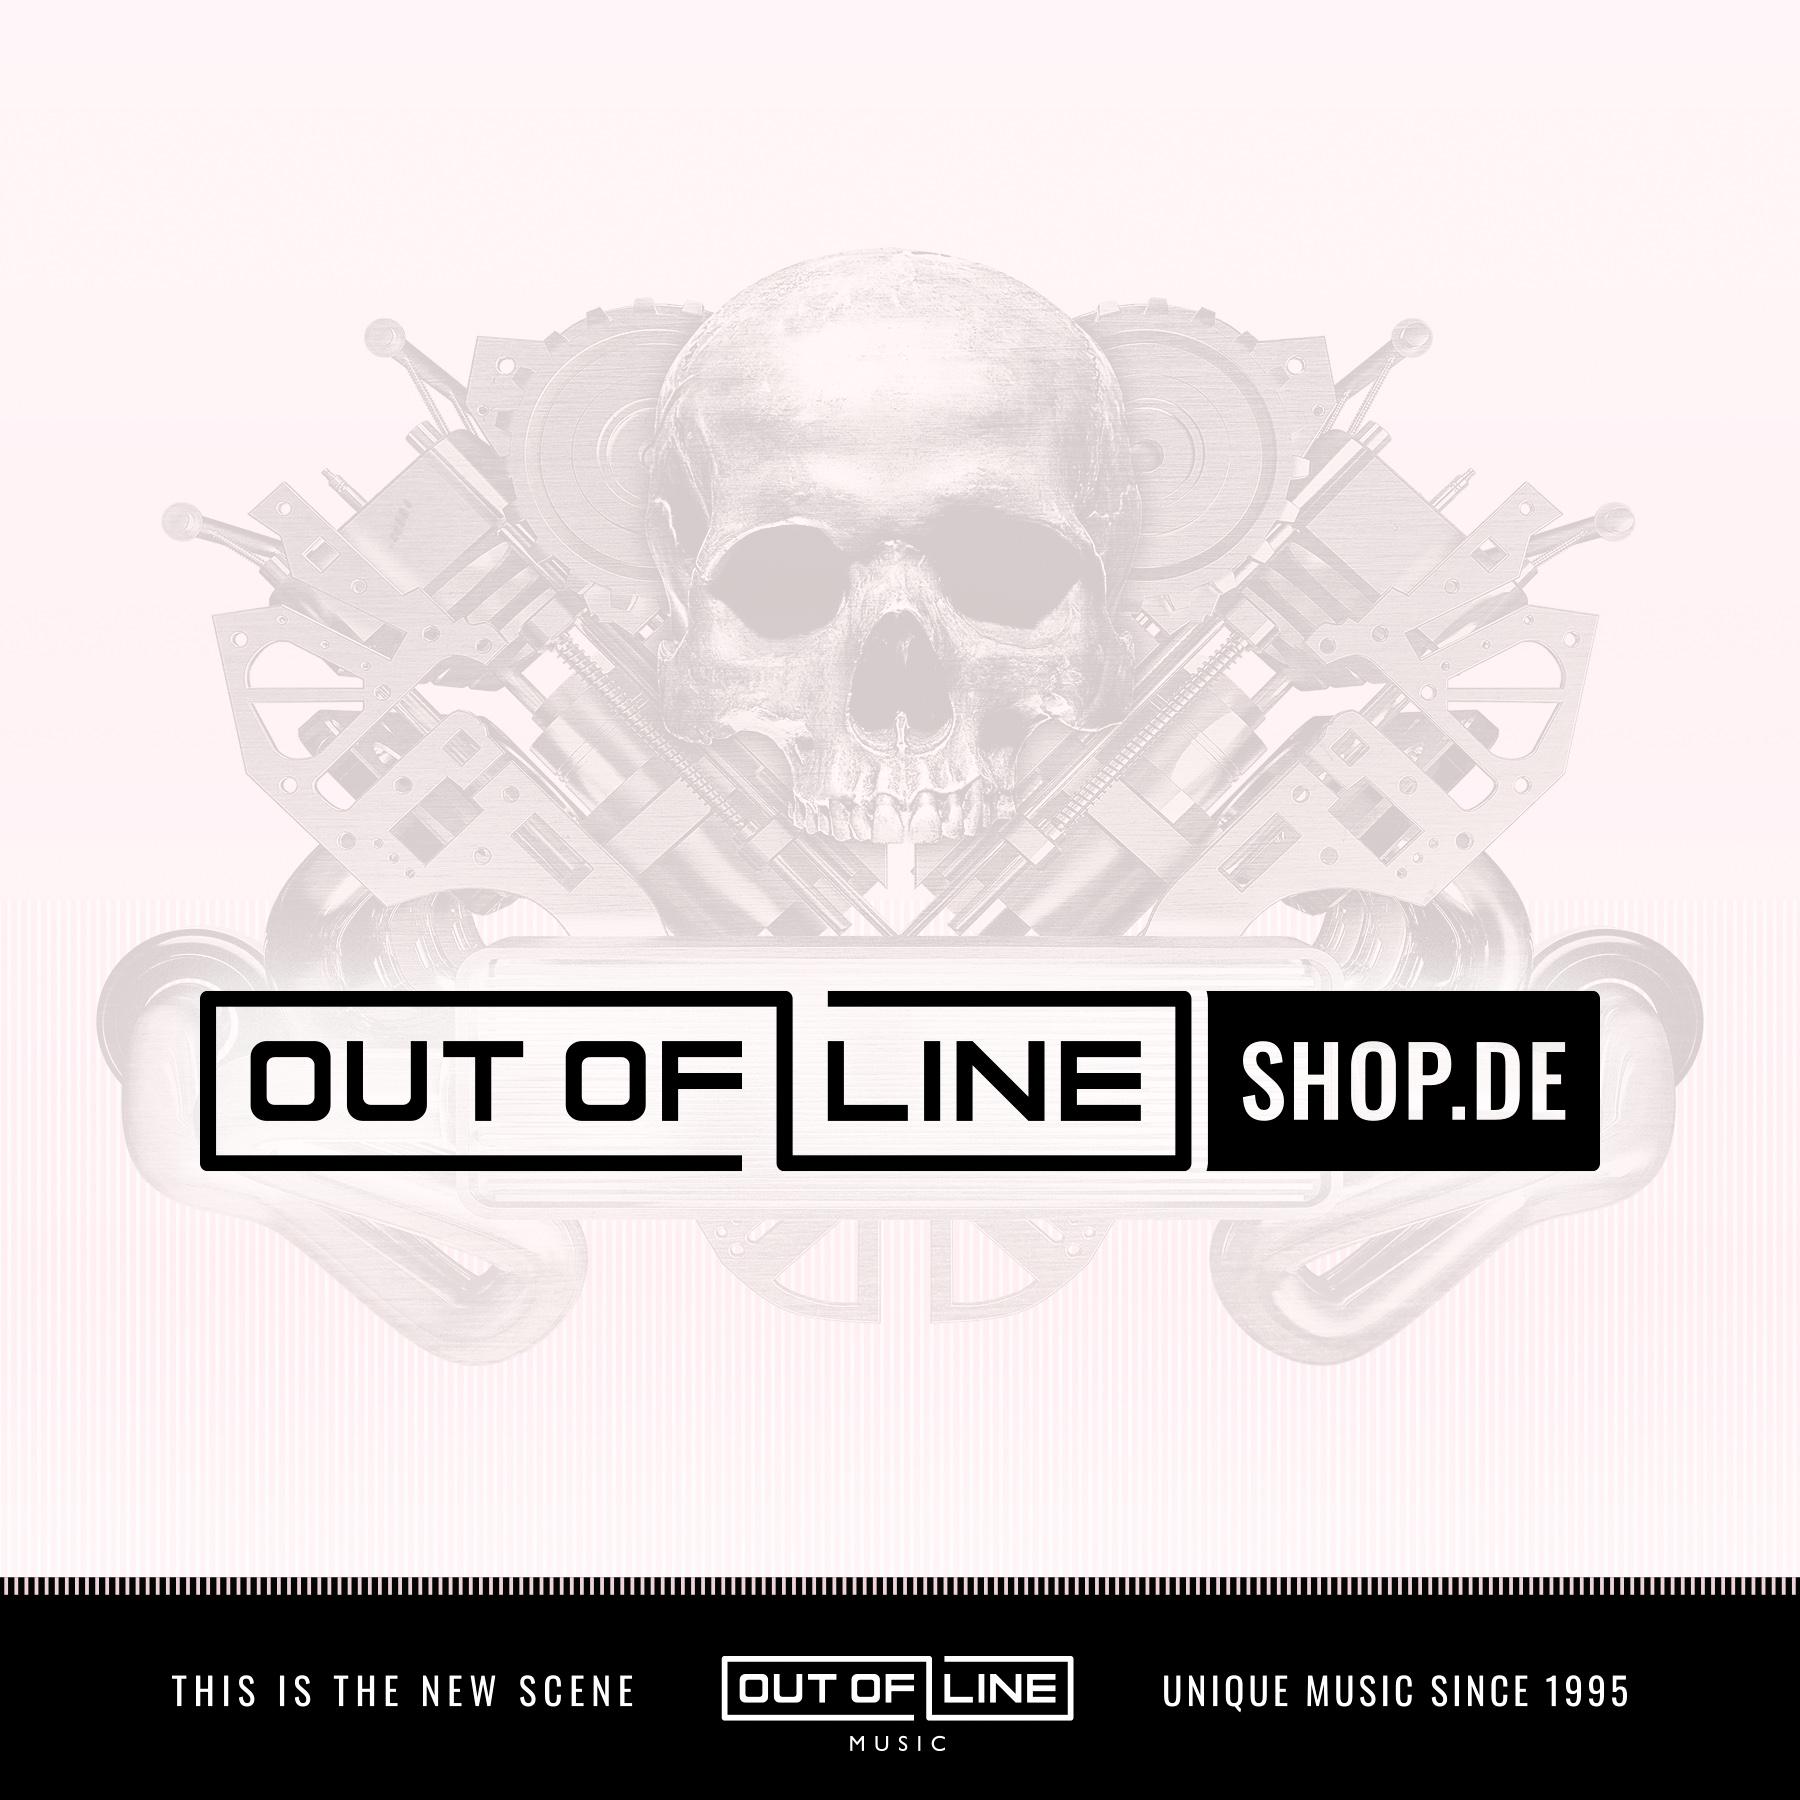 Eisbrecher - Schicksalsmelodien (Limited Edition) - FAN-BOX